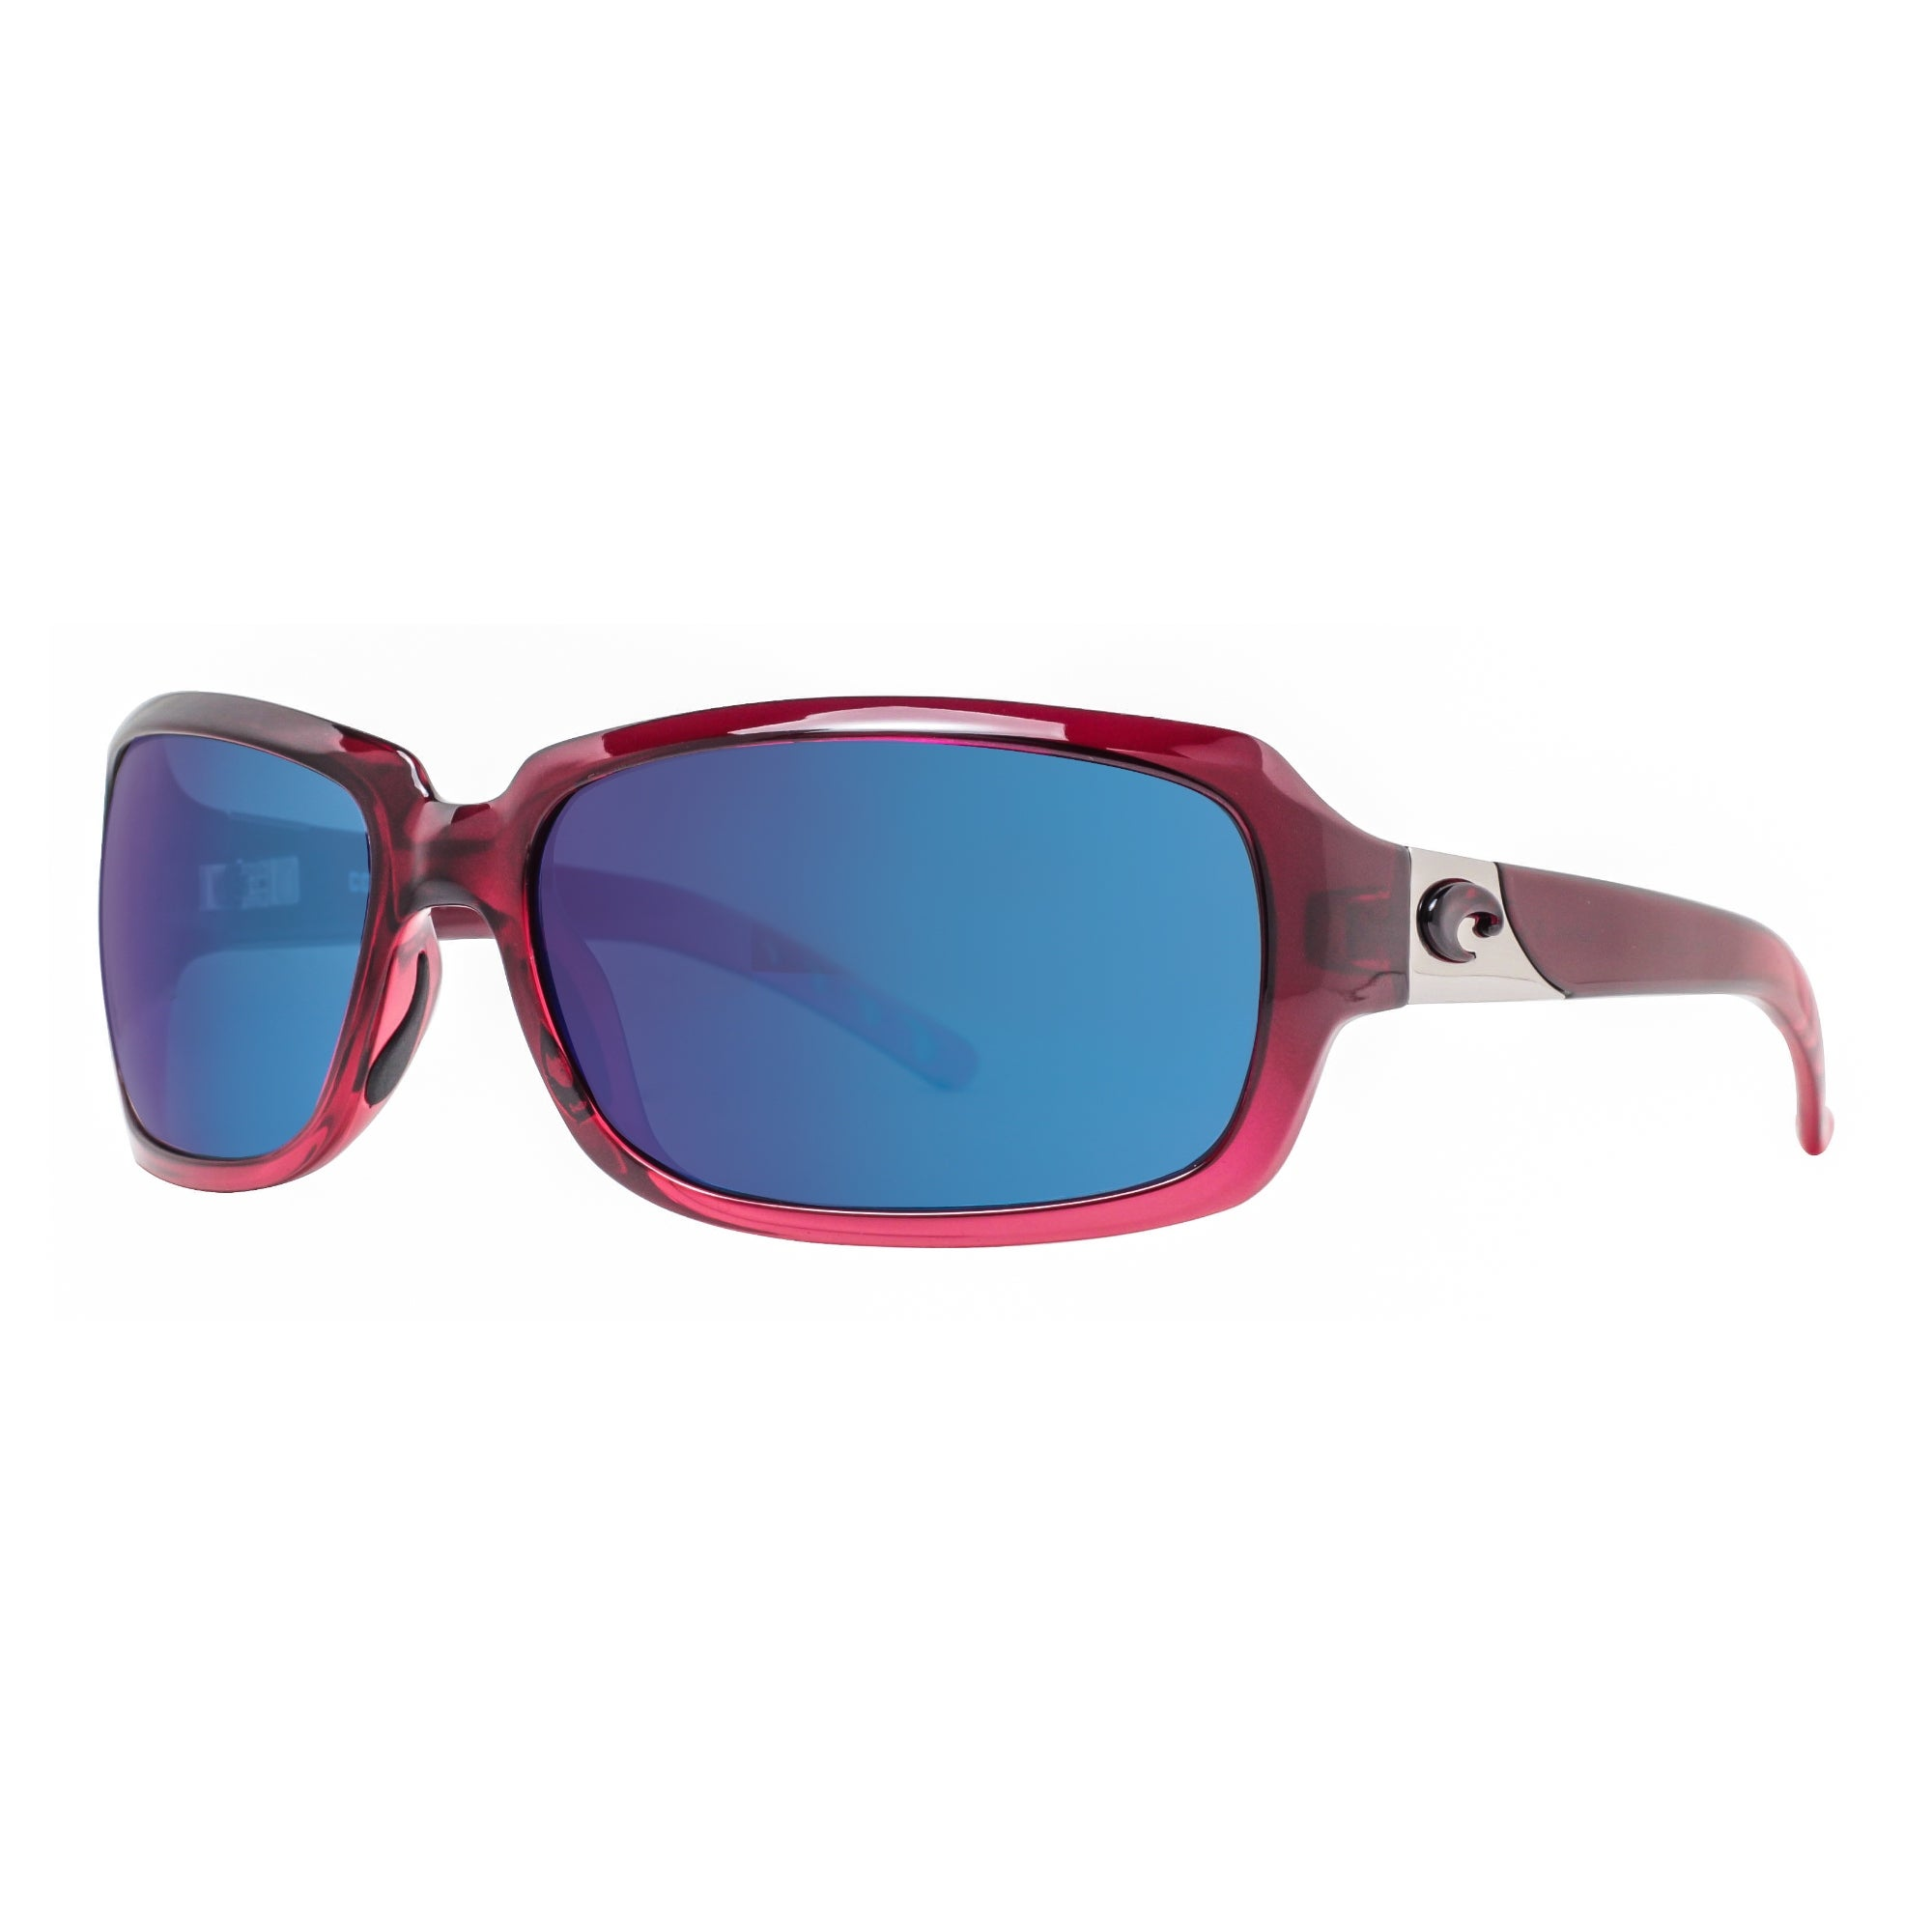 f72121313c0 Costa Del Mar Isabela IB48OBMP Pomegranate Fade Pink 580P Blue Mirror  Sunglasses - pomegranate fade - 63mm-17mm-124mm